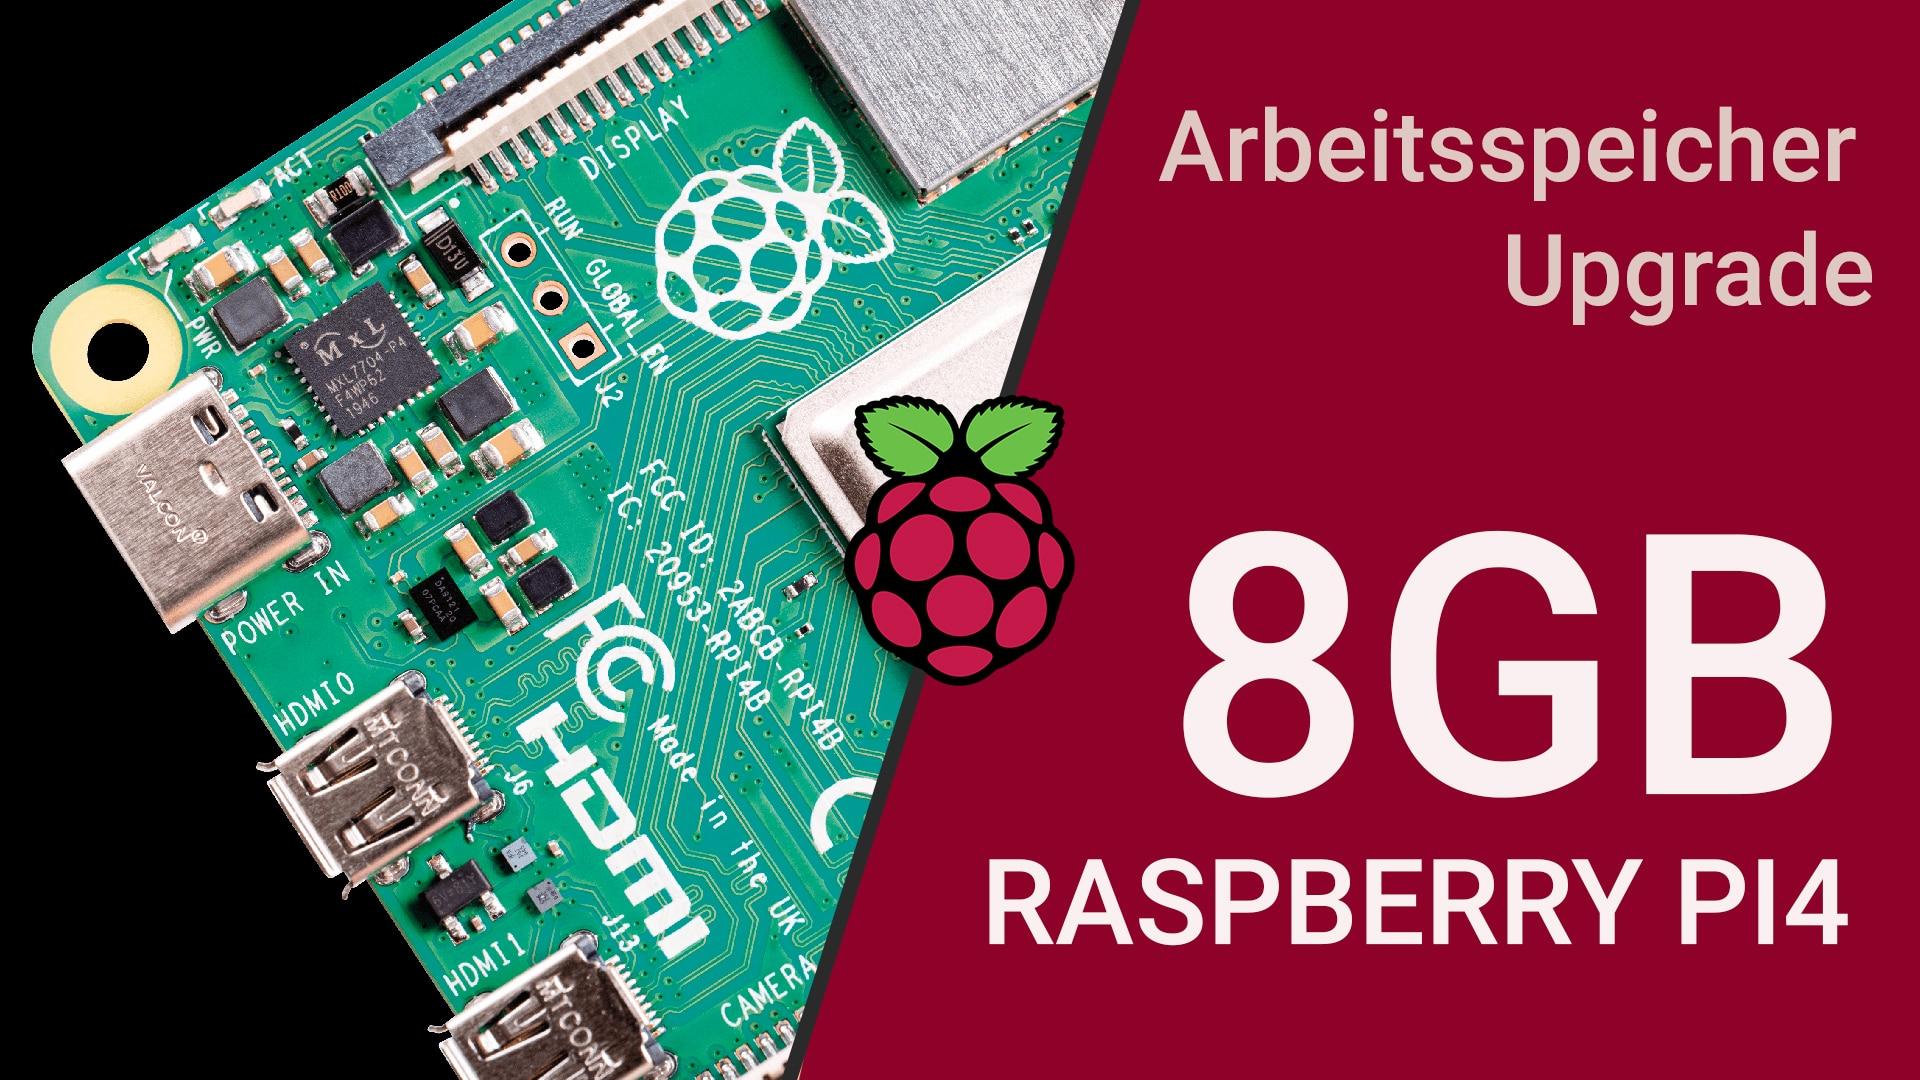 Raspberry Pi 4 8GB - digitalewelt.at